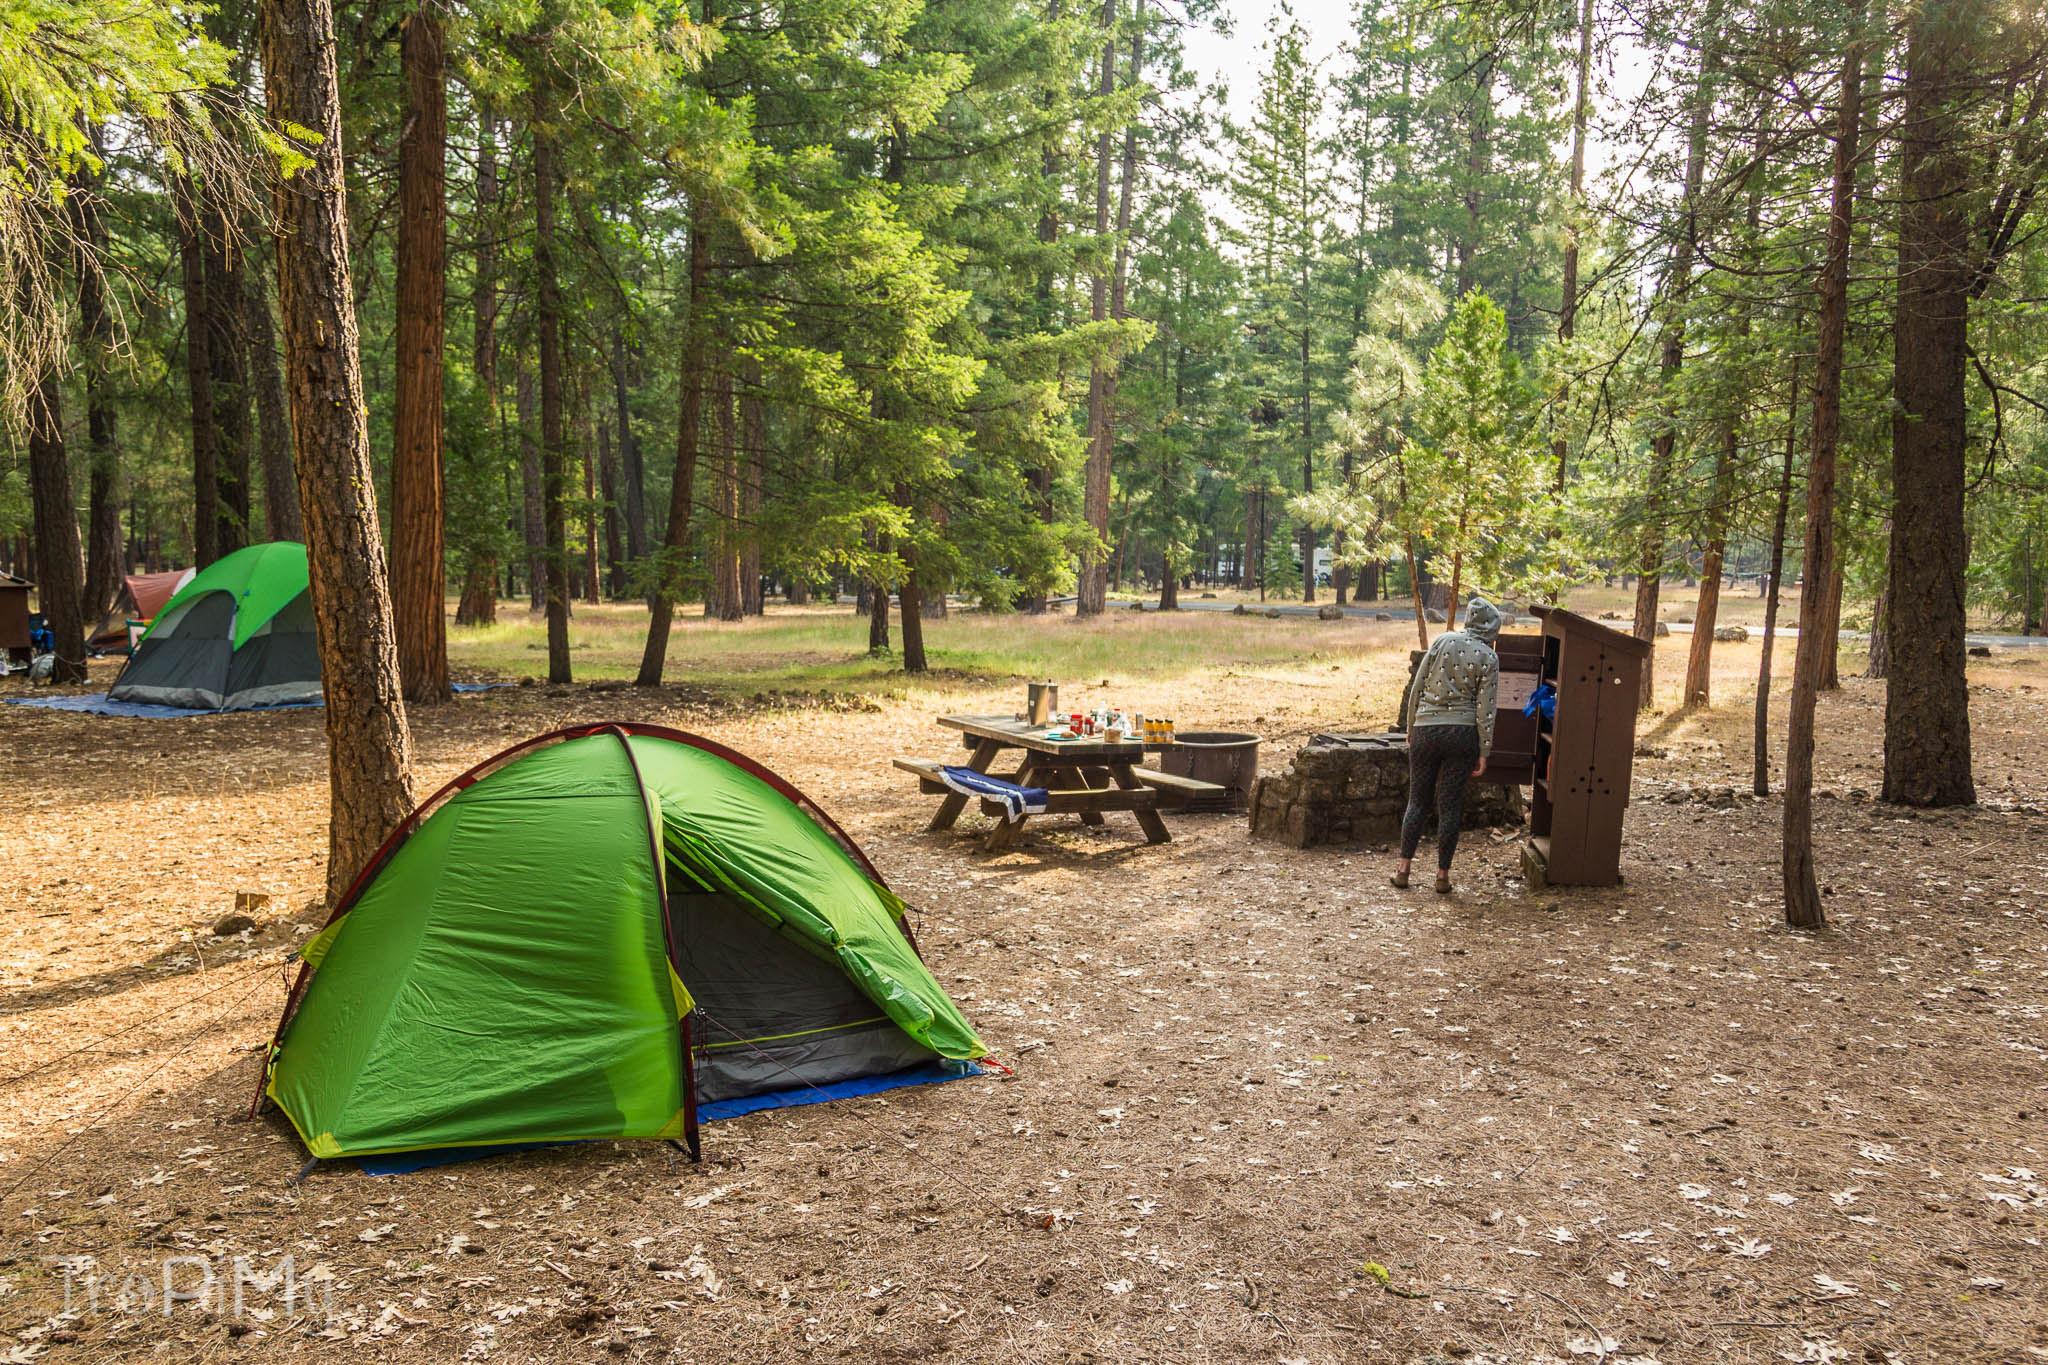 McArthur-Burney Falls campground